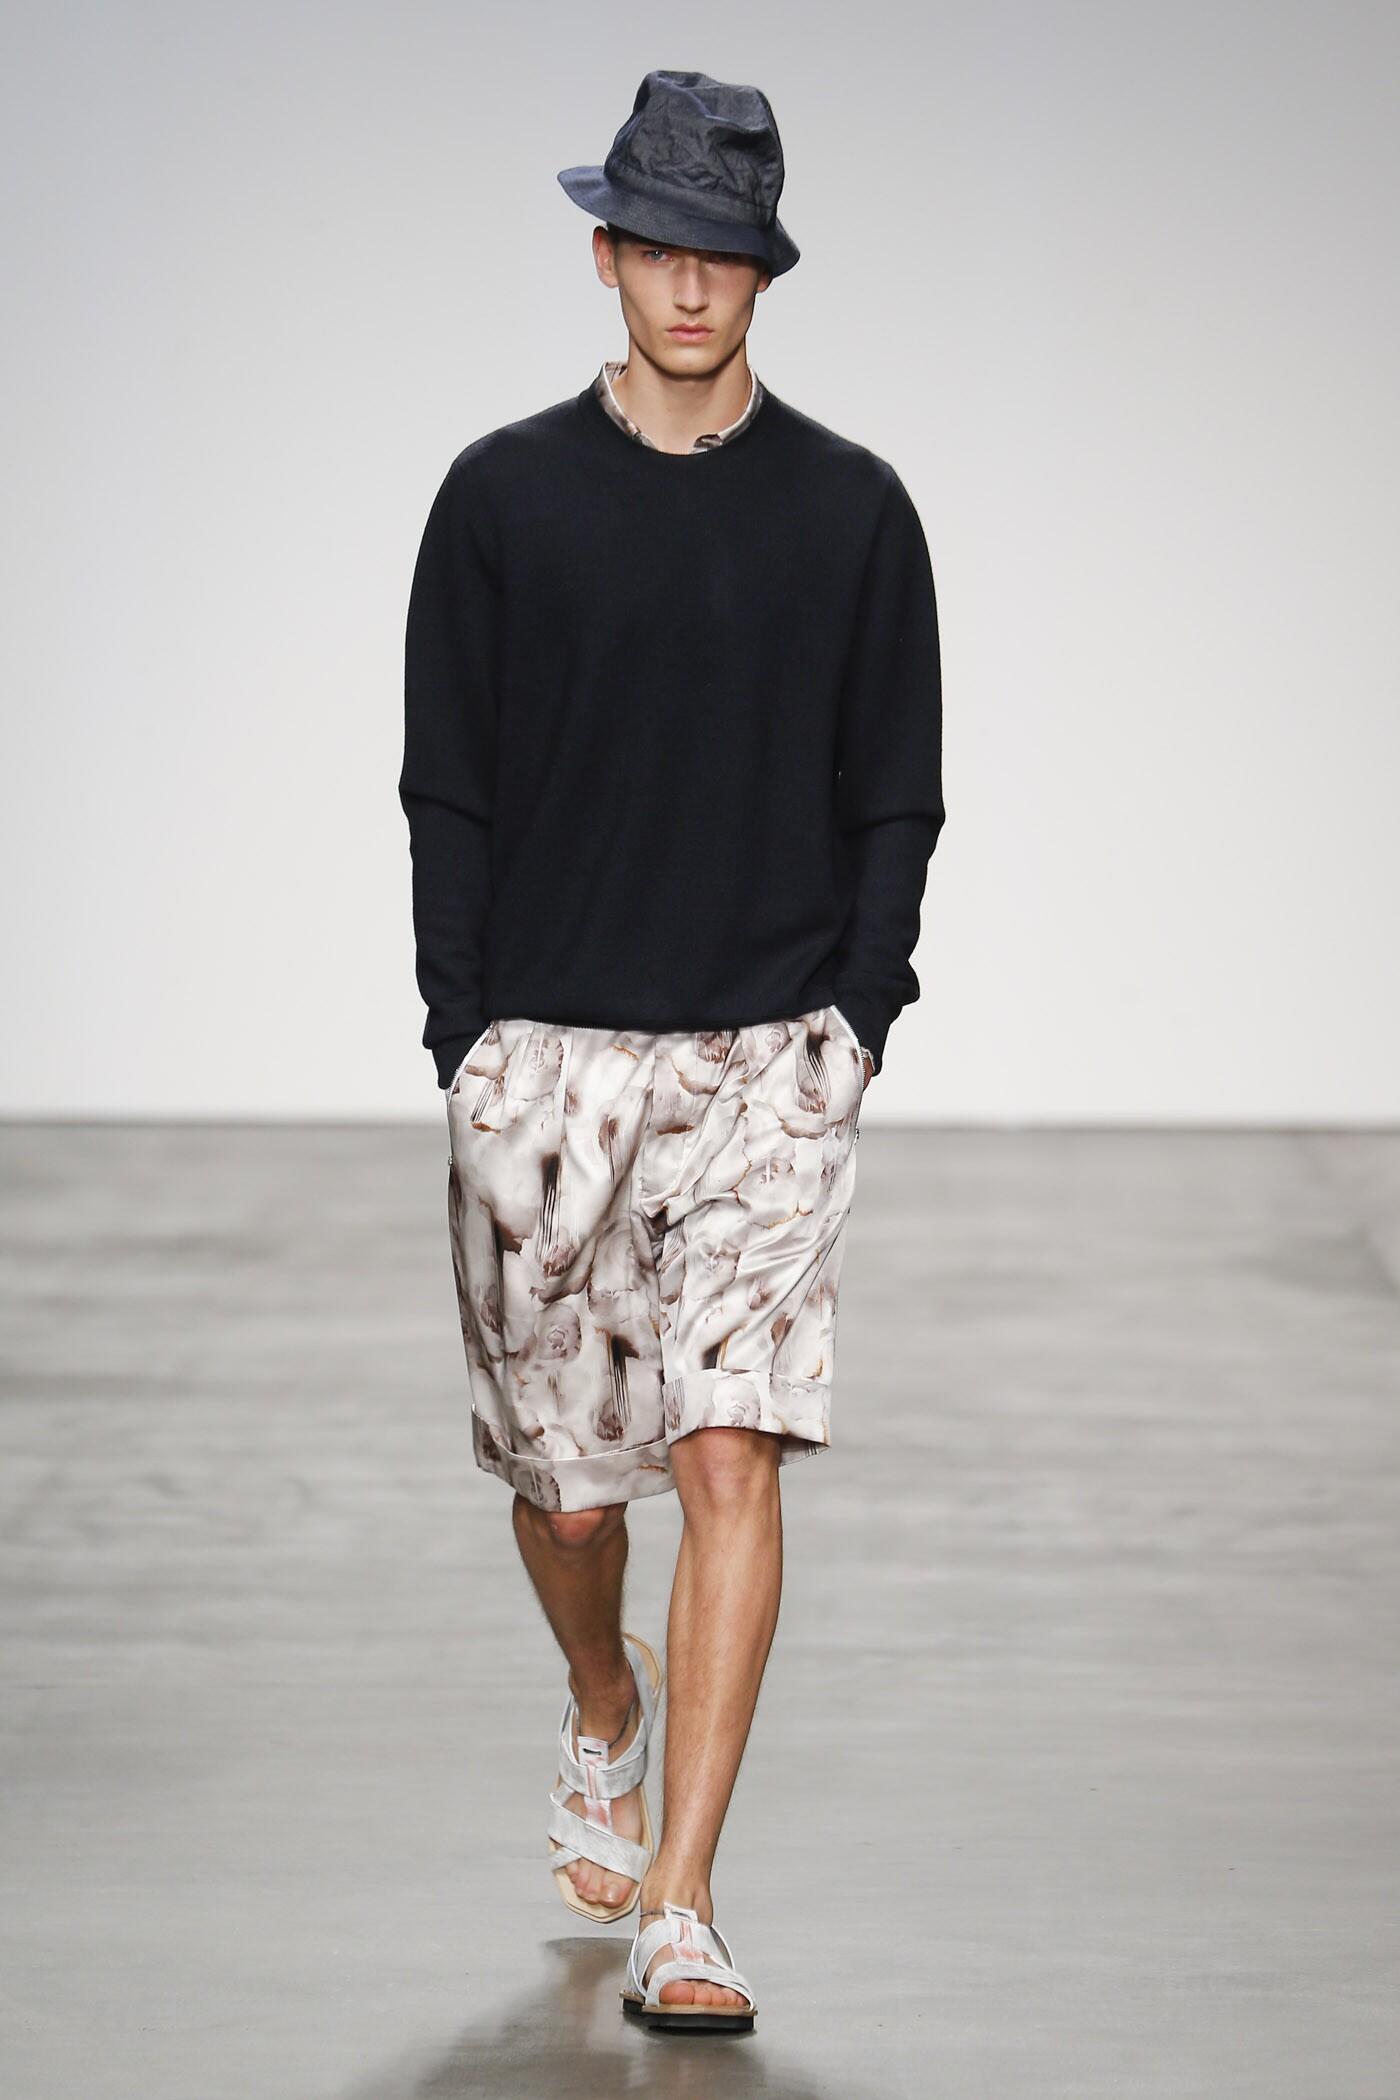 Catwalk Iceberg Man Fashion Show Summer 2015